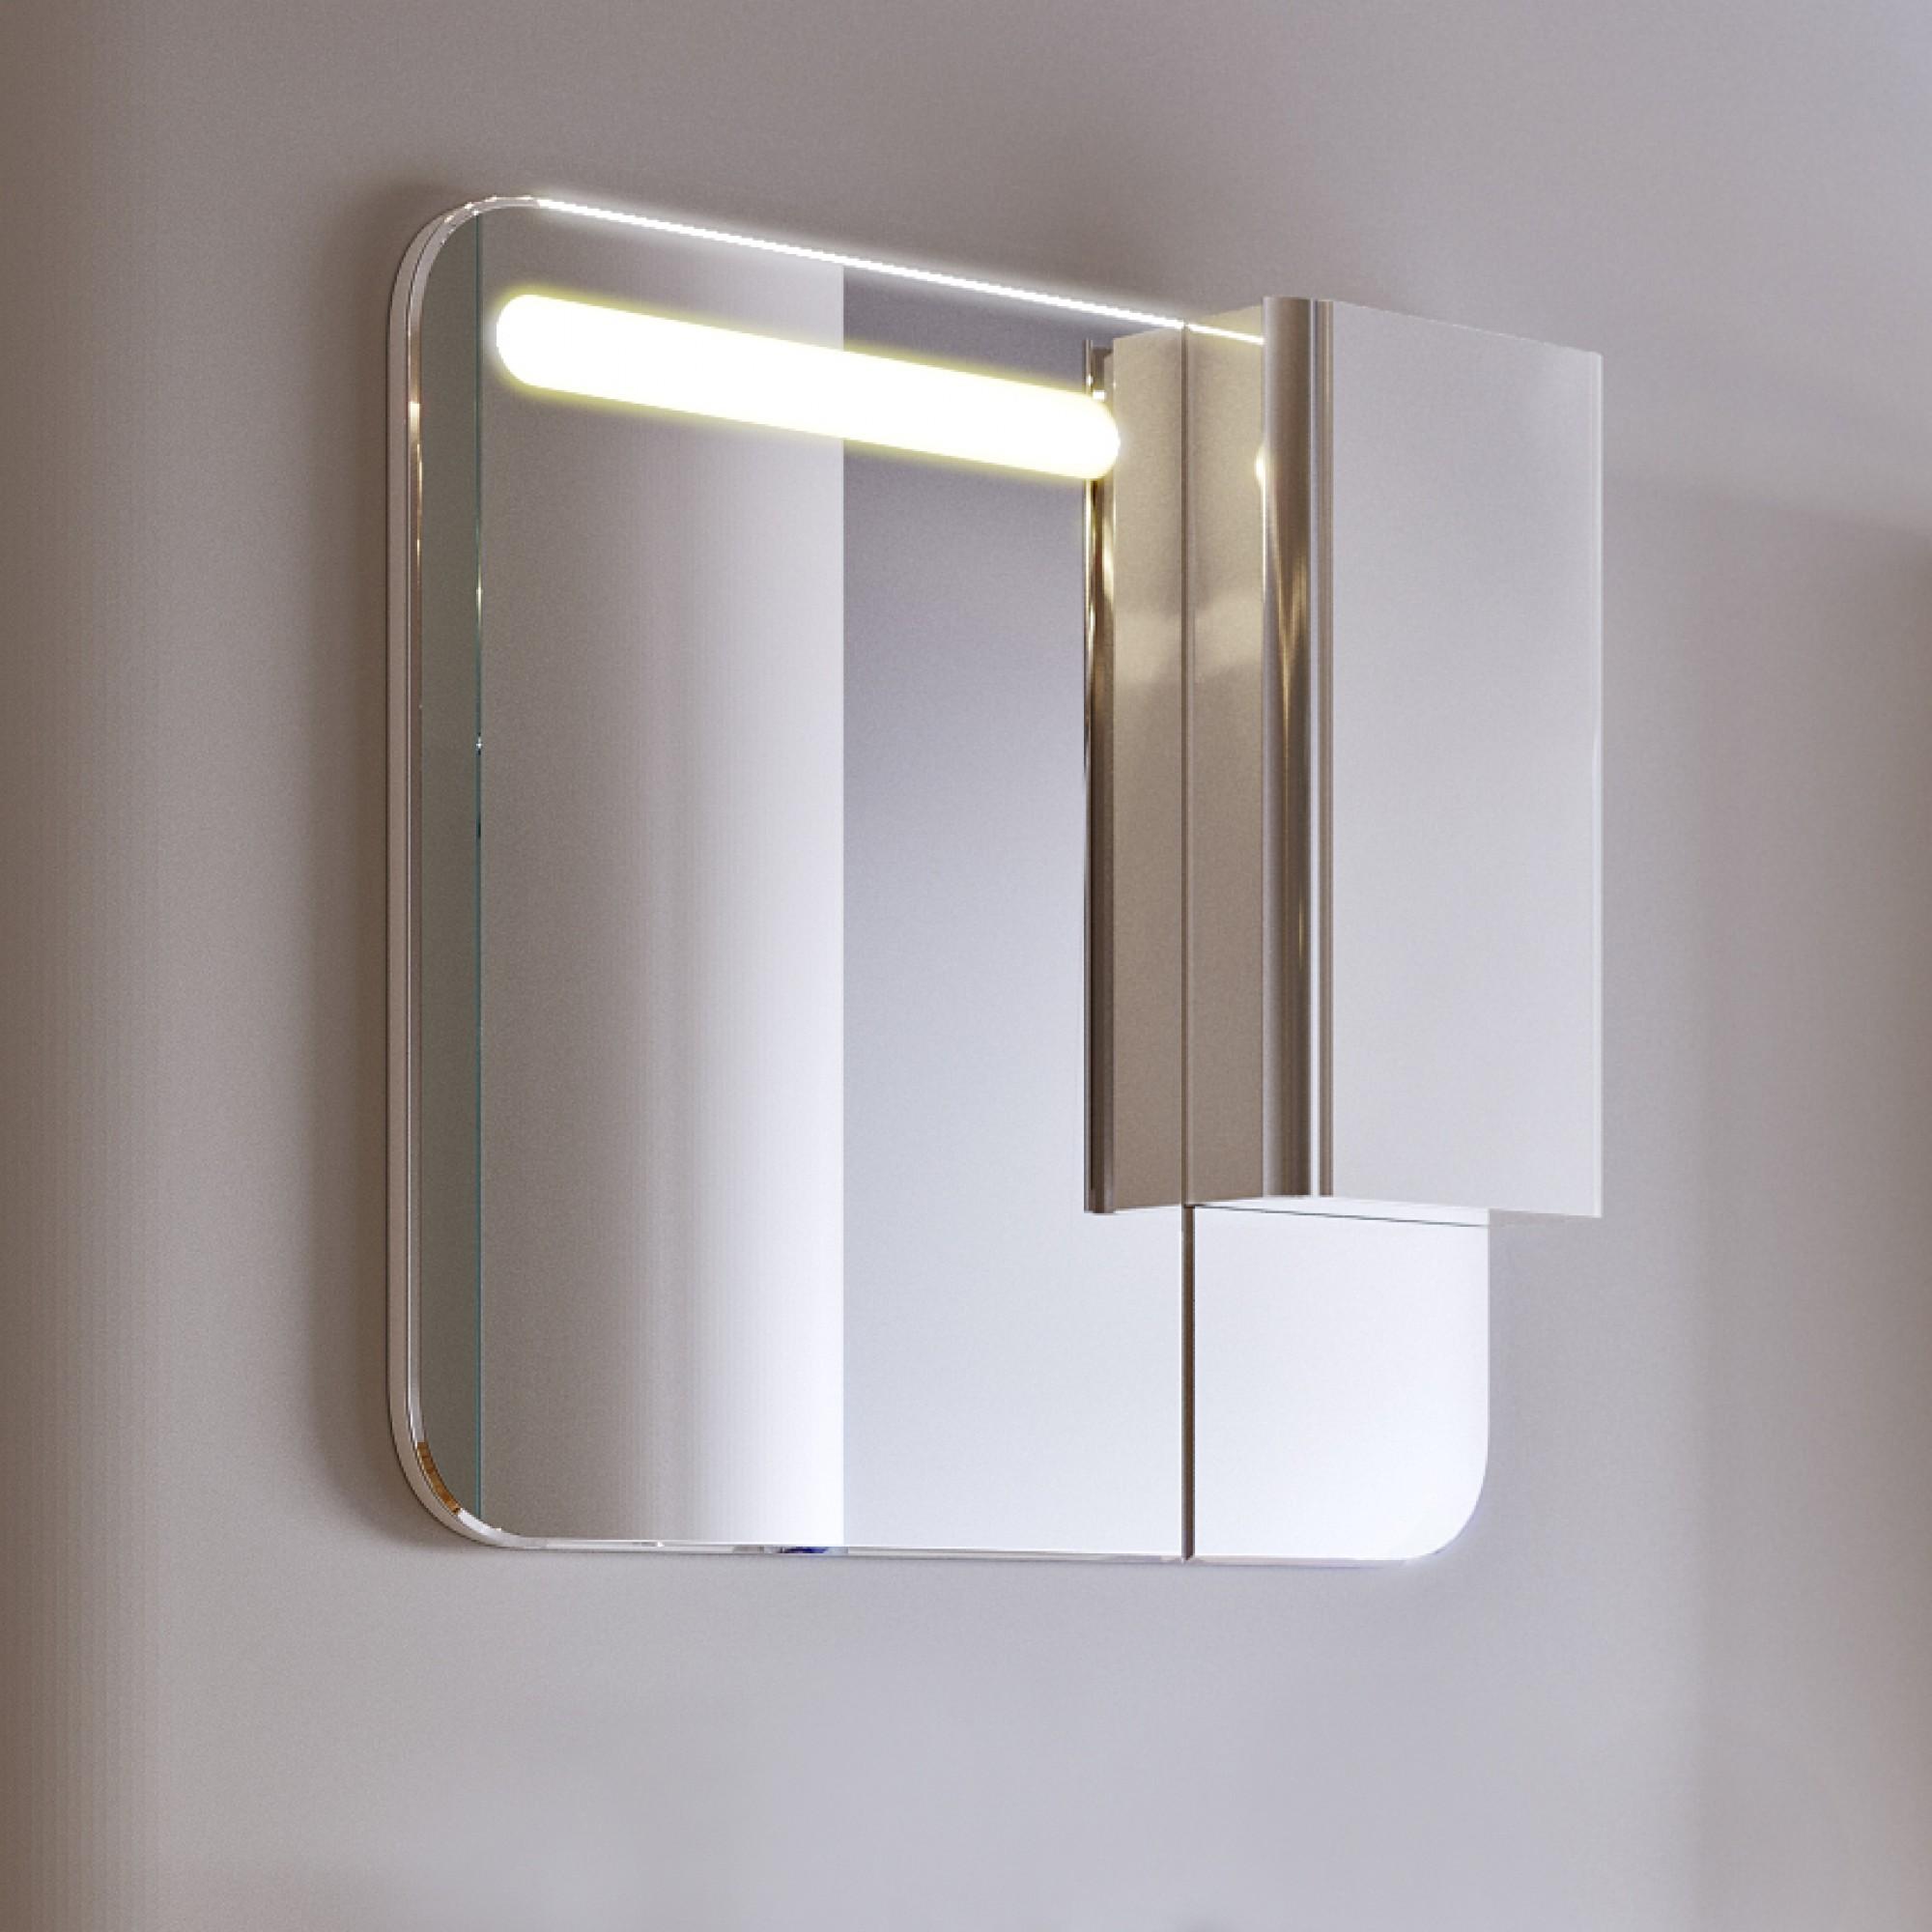 Зеркало-шкаф Largo 80